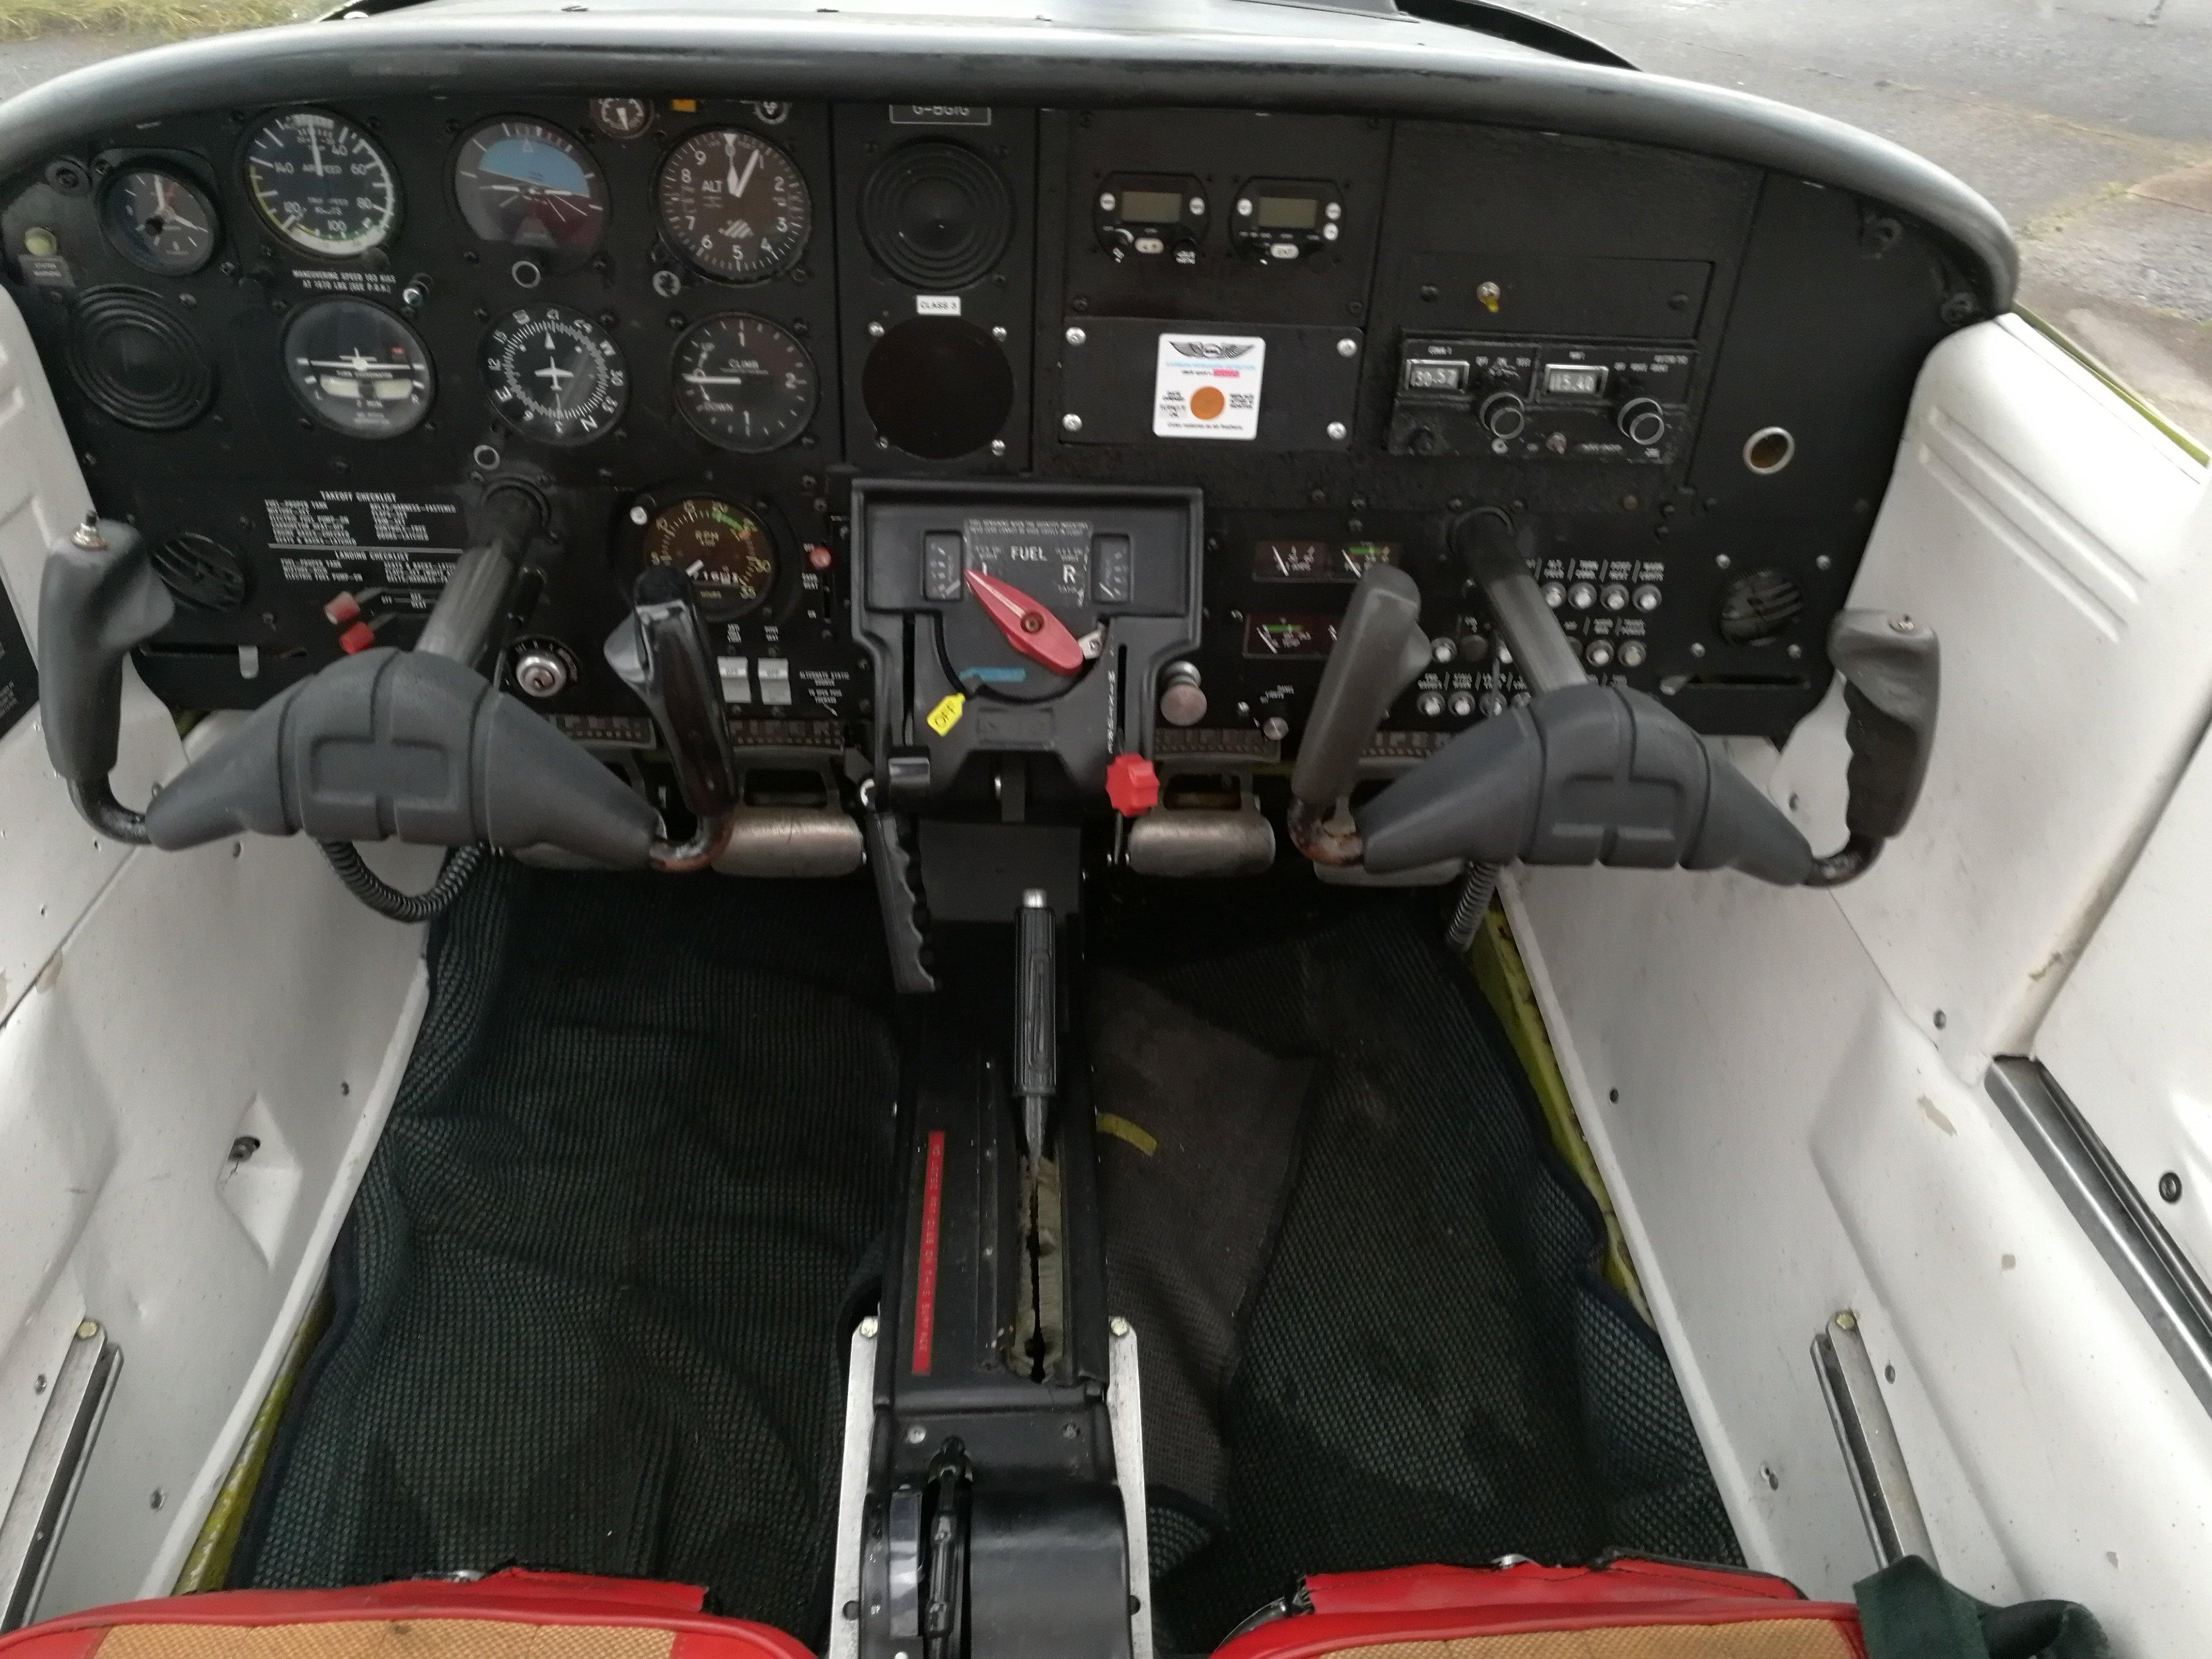 Piper Tomahawk Cockpit